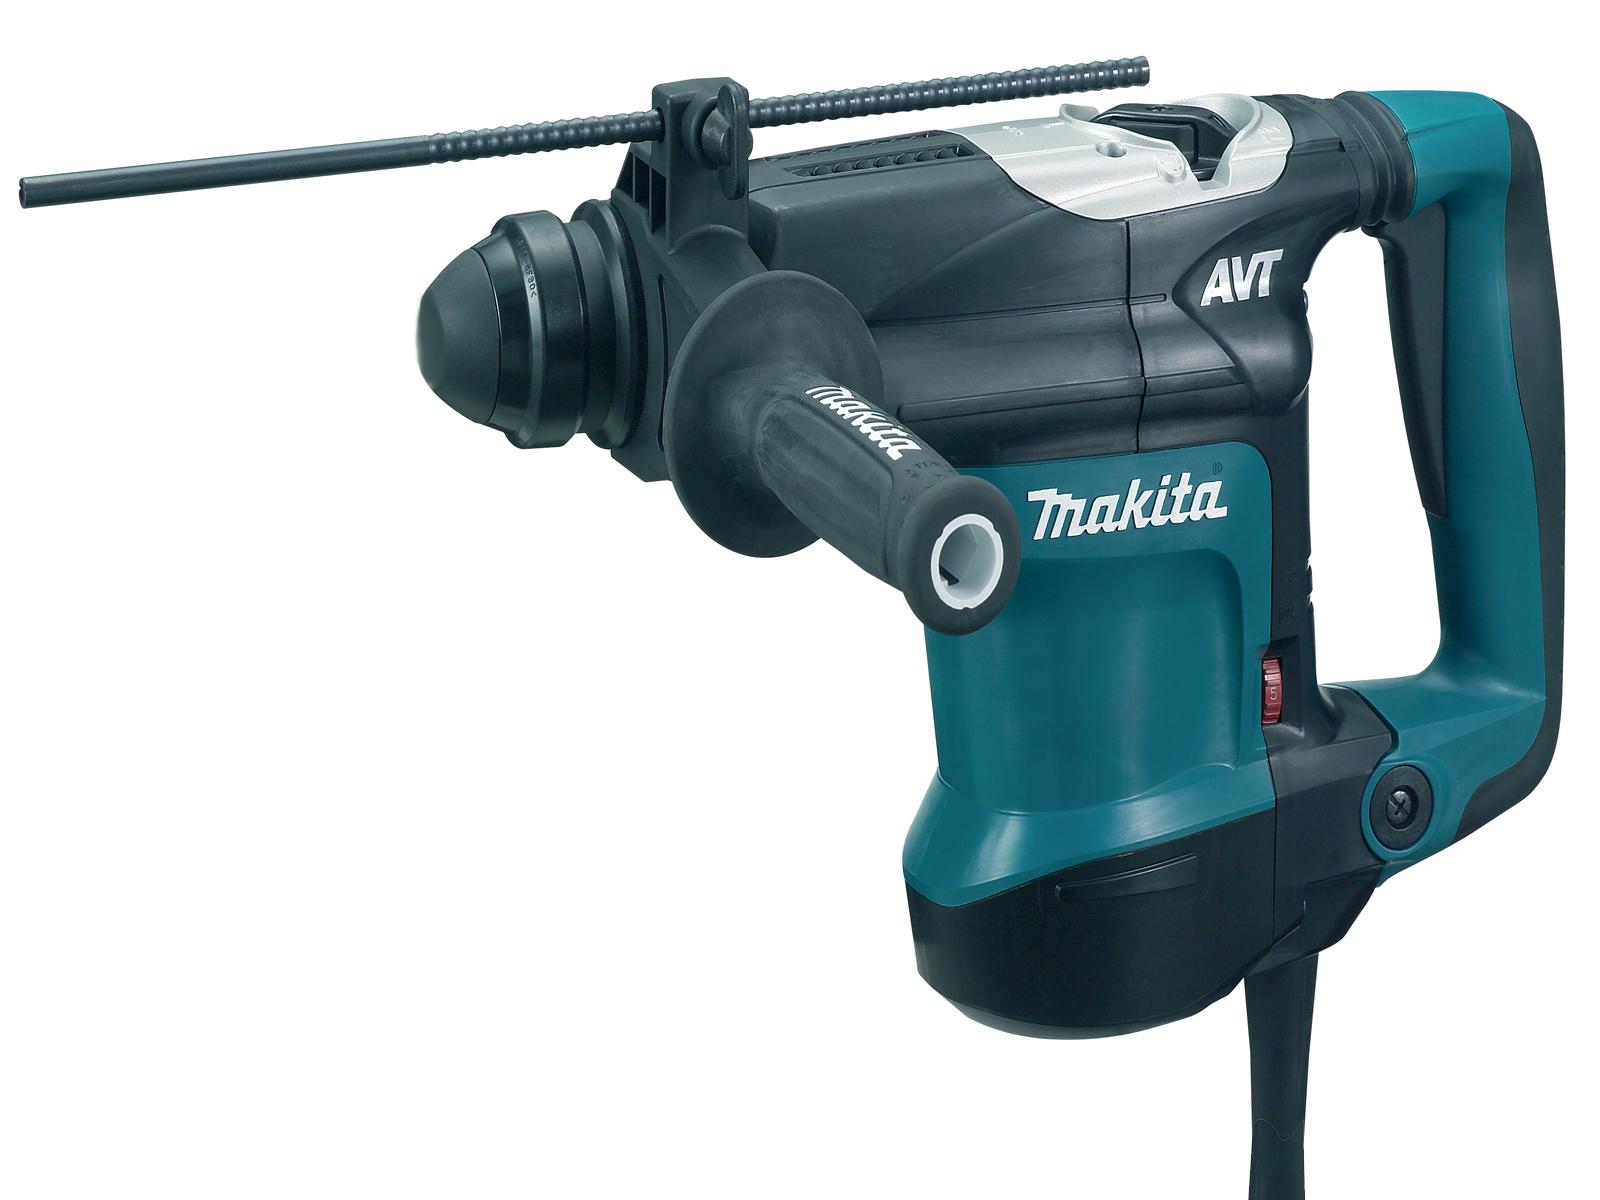 Makita HR3210C 110V 32mm SDS-Plus Rotary Hammer Drill 3-Mode